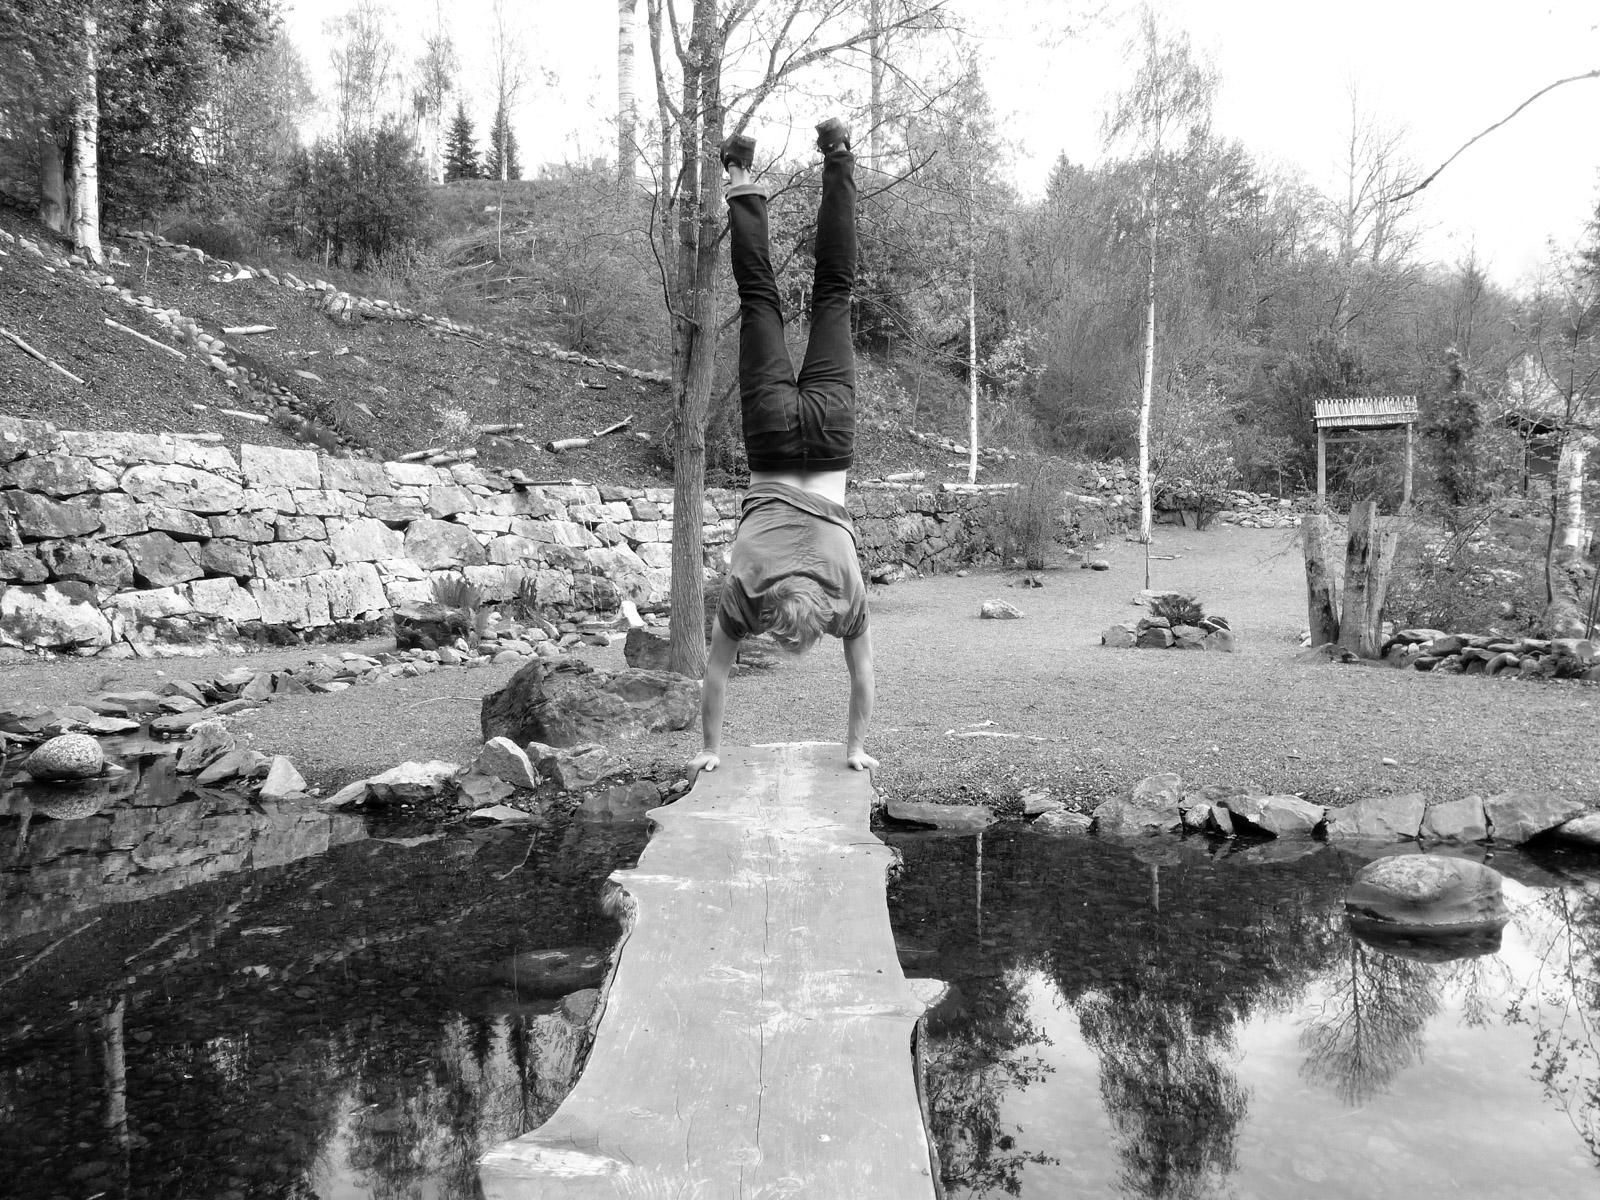 Park handstand